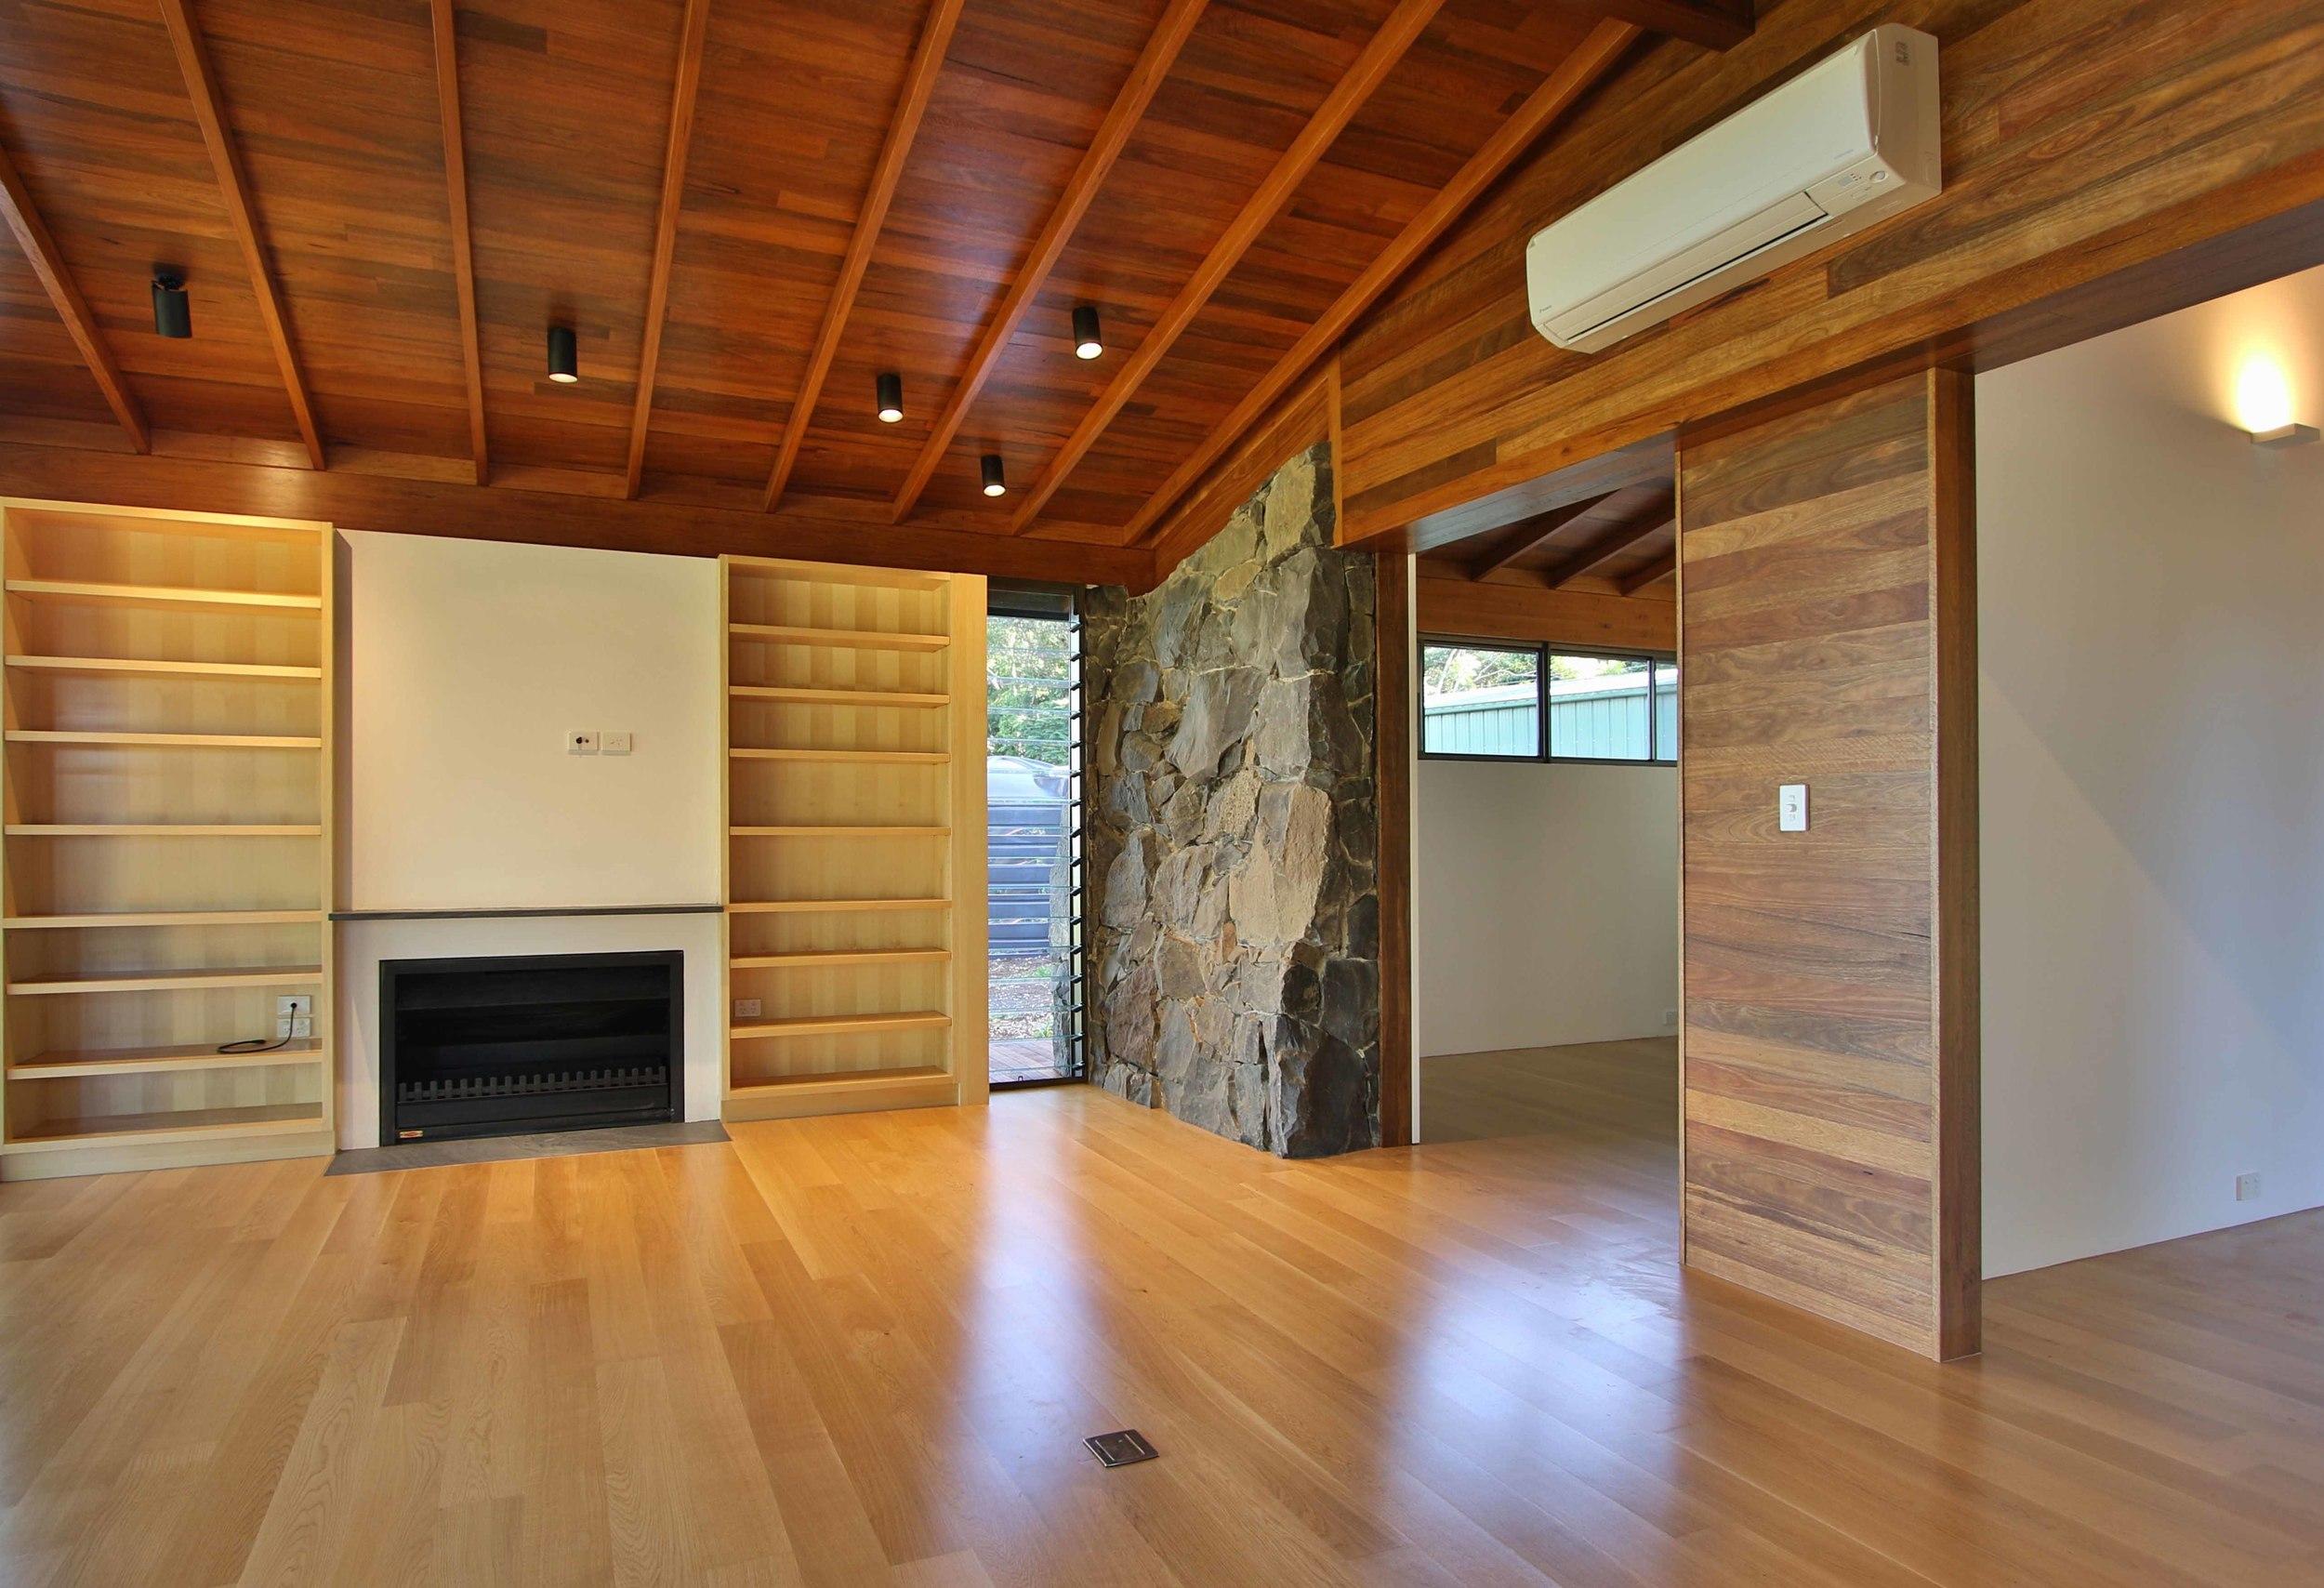 Interior Newrybar guesthouse, Ballina Shire